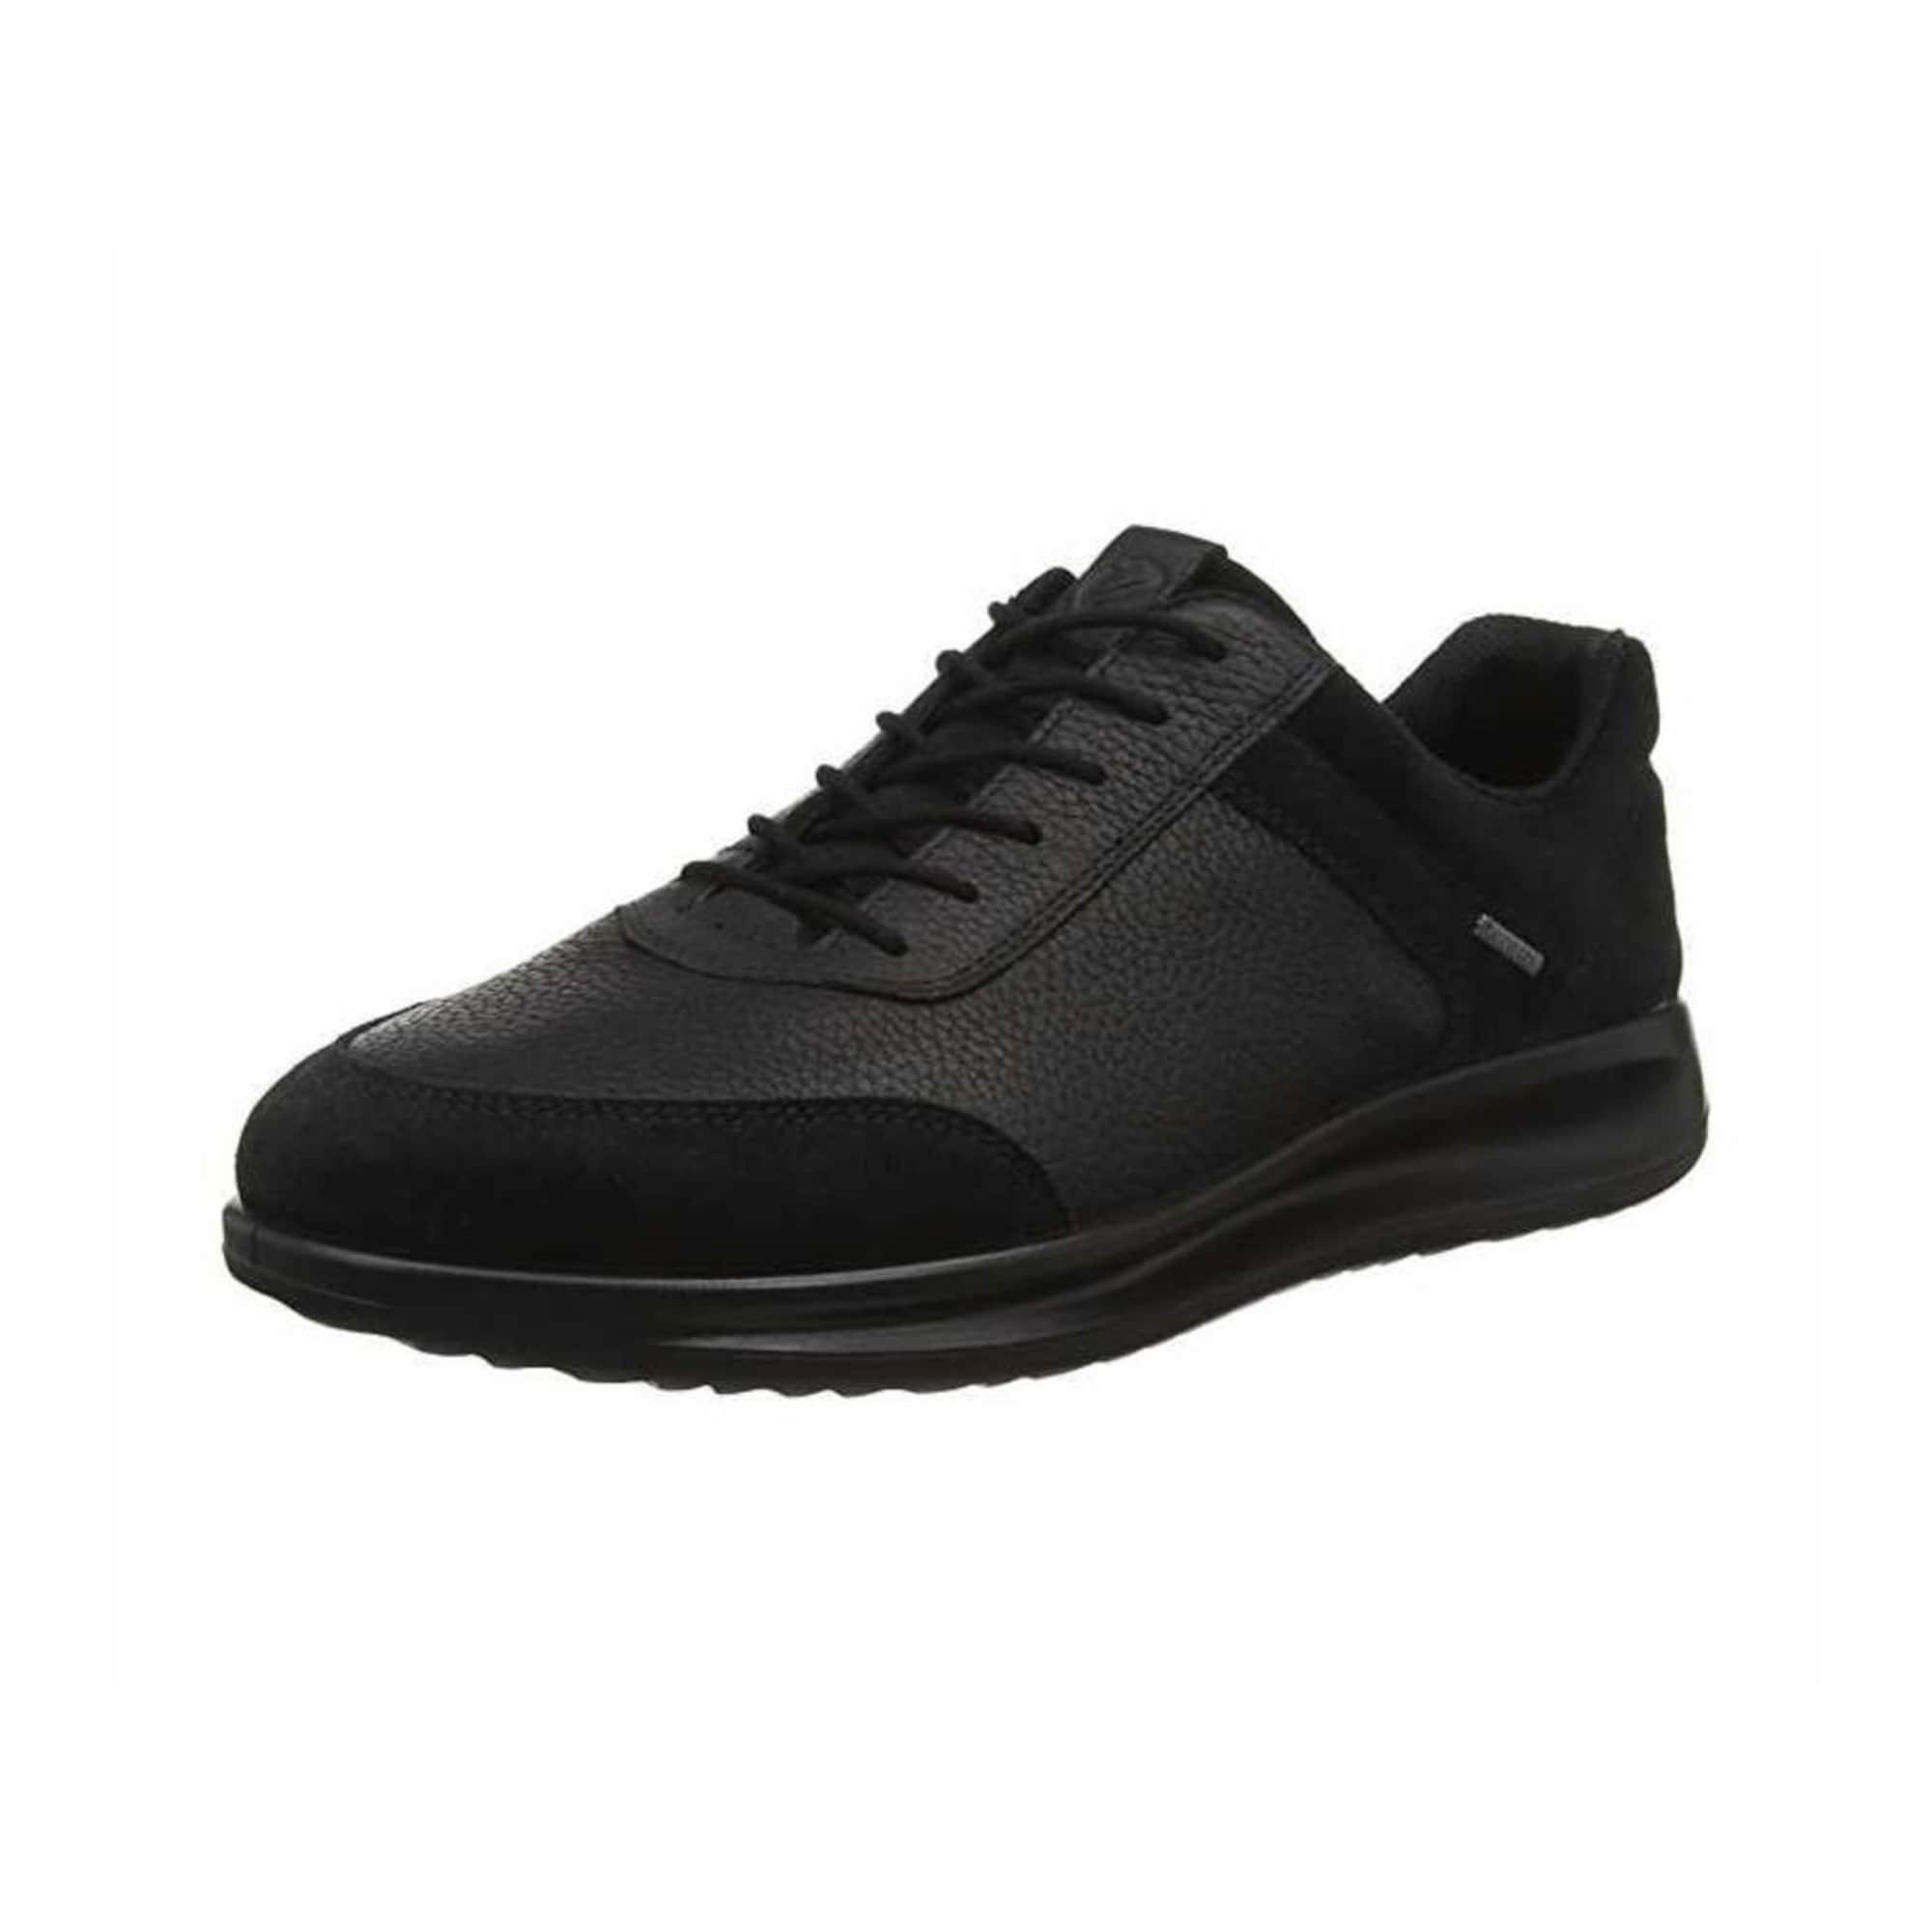 Schnürschuhe   Schuhe > Schnürschuhe   ECCO